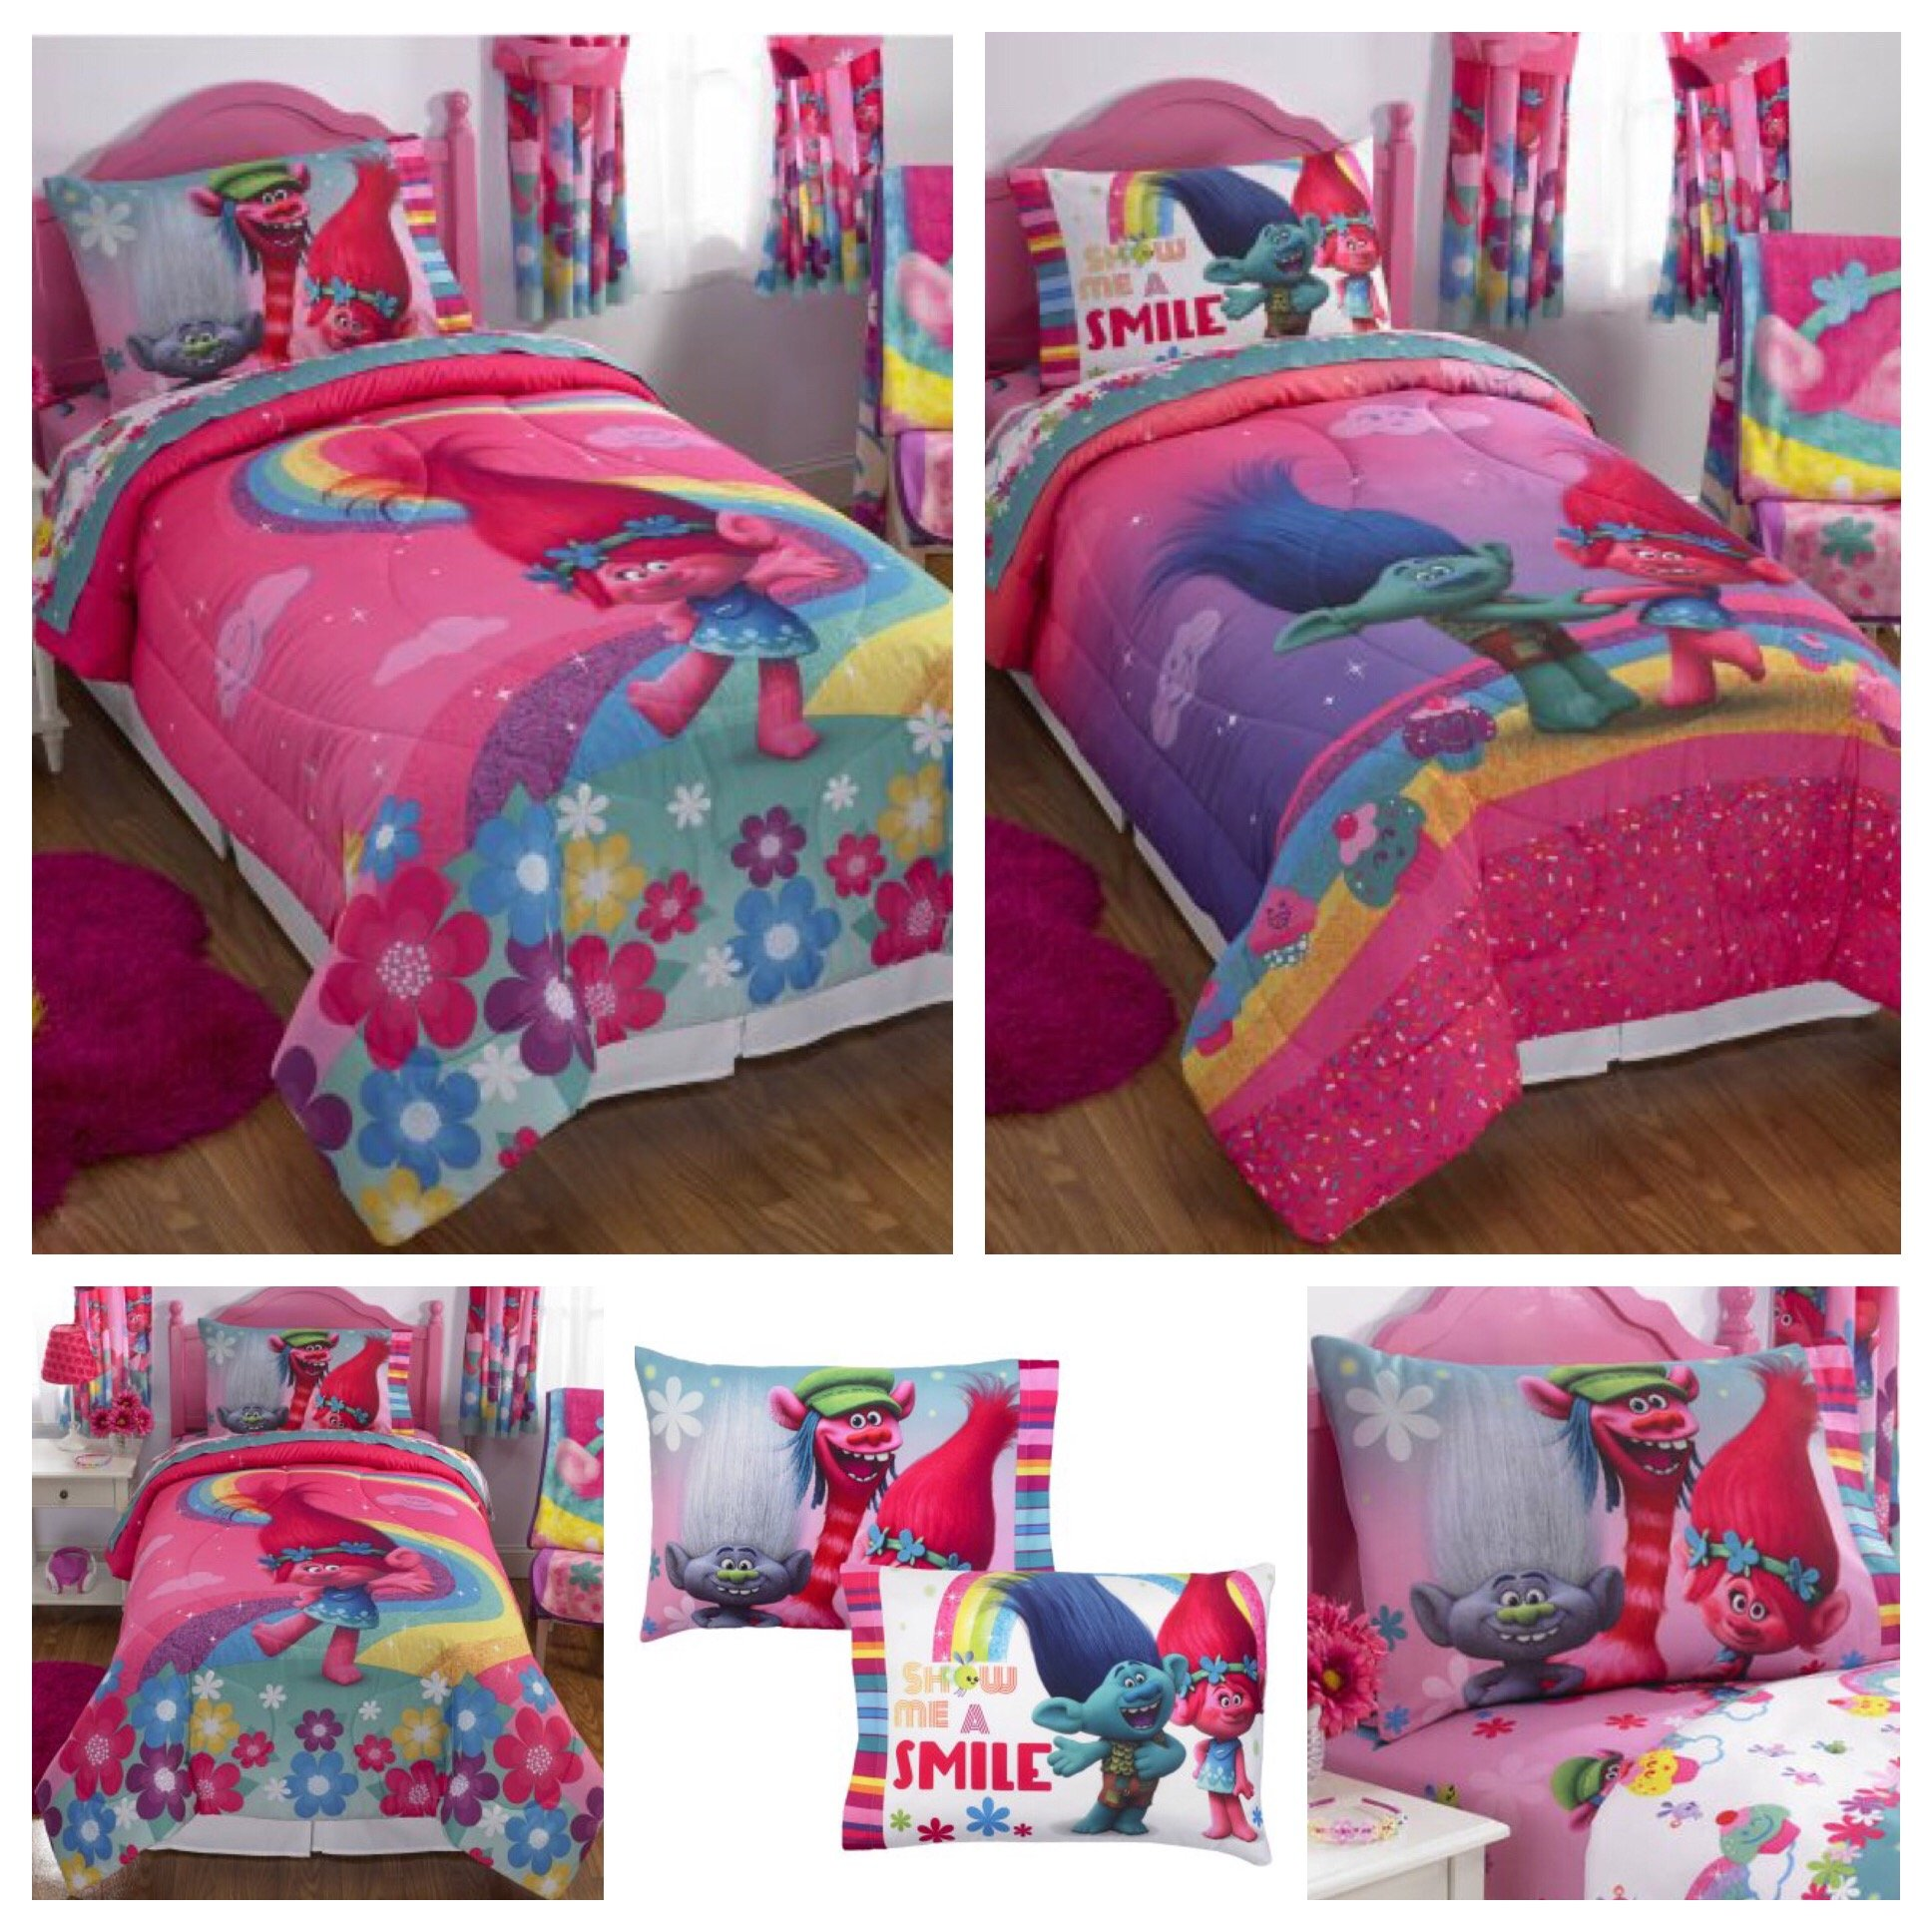 DreamWorks Trolls Complete 4 Piece Girls Comforter Set - Twin